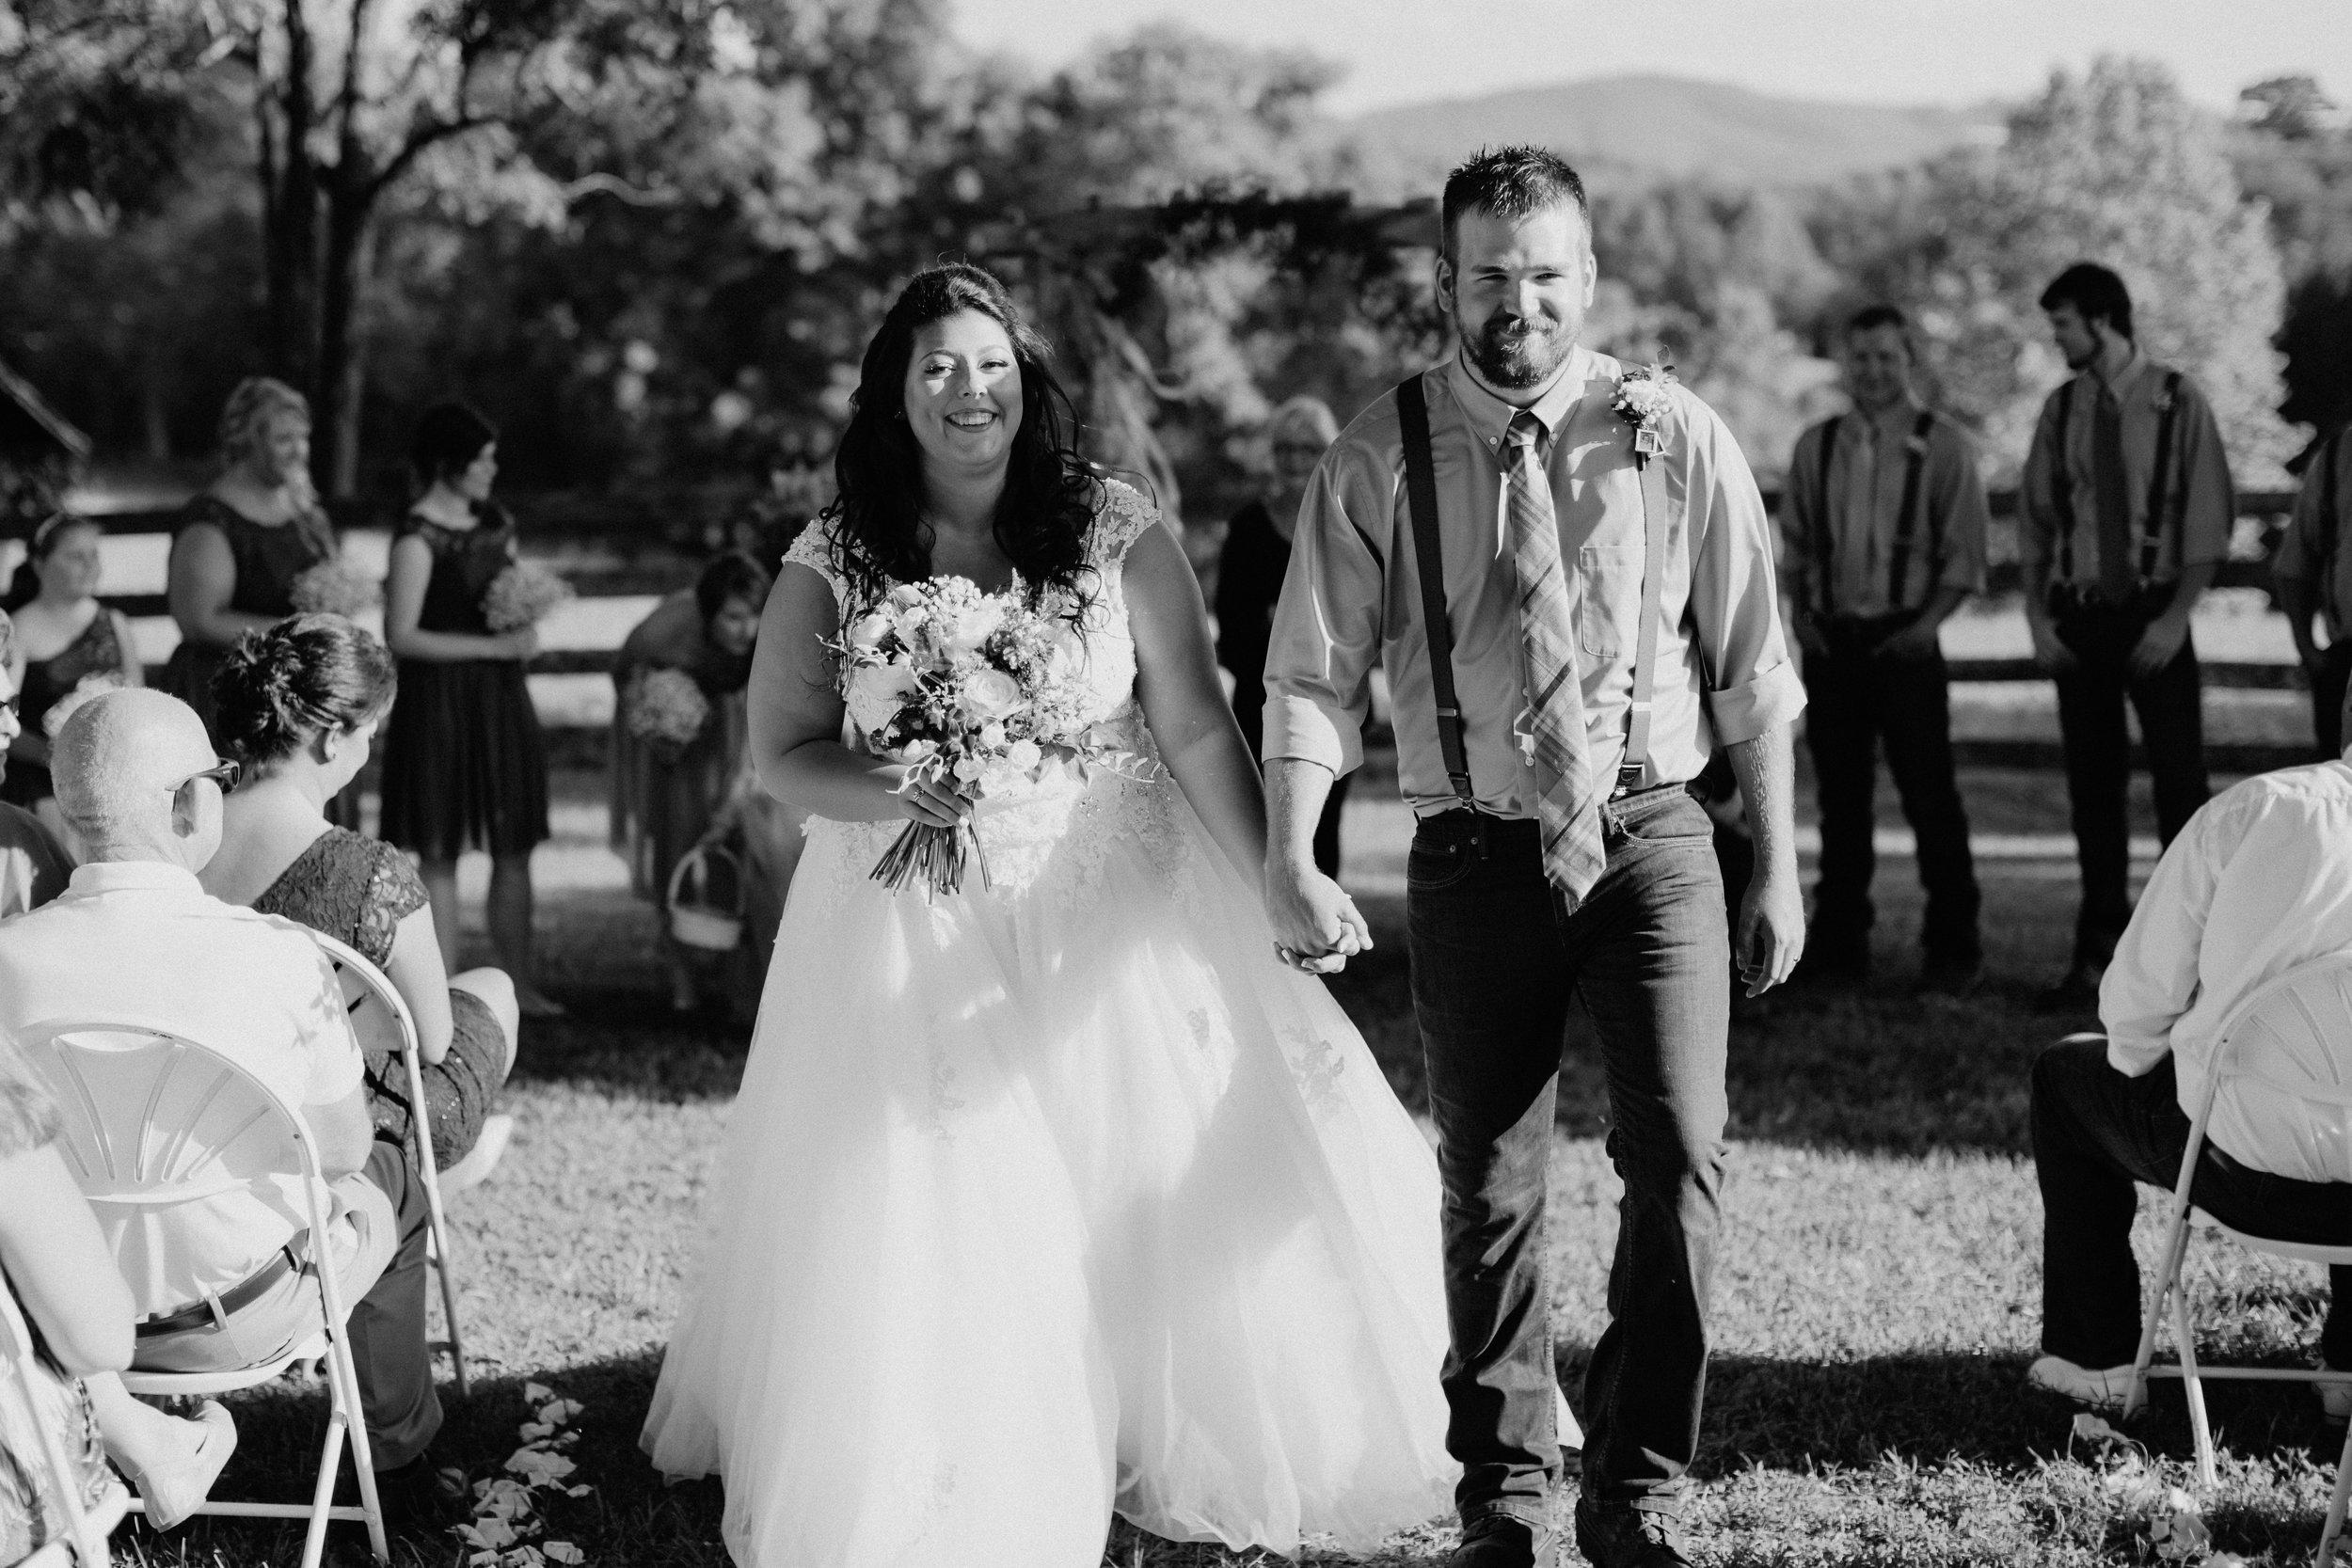 Sorella Farms_Lynchburg Wedding Photographer_Lynchburg Wedding Venue_Lynchburg Photographer-23.jpg